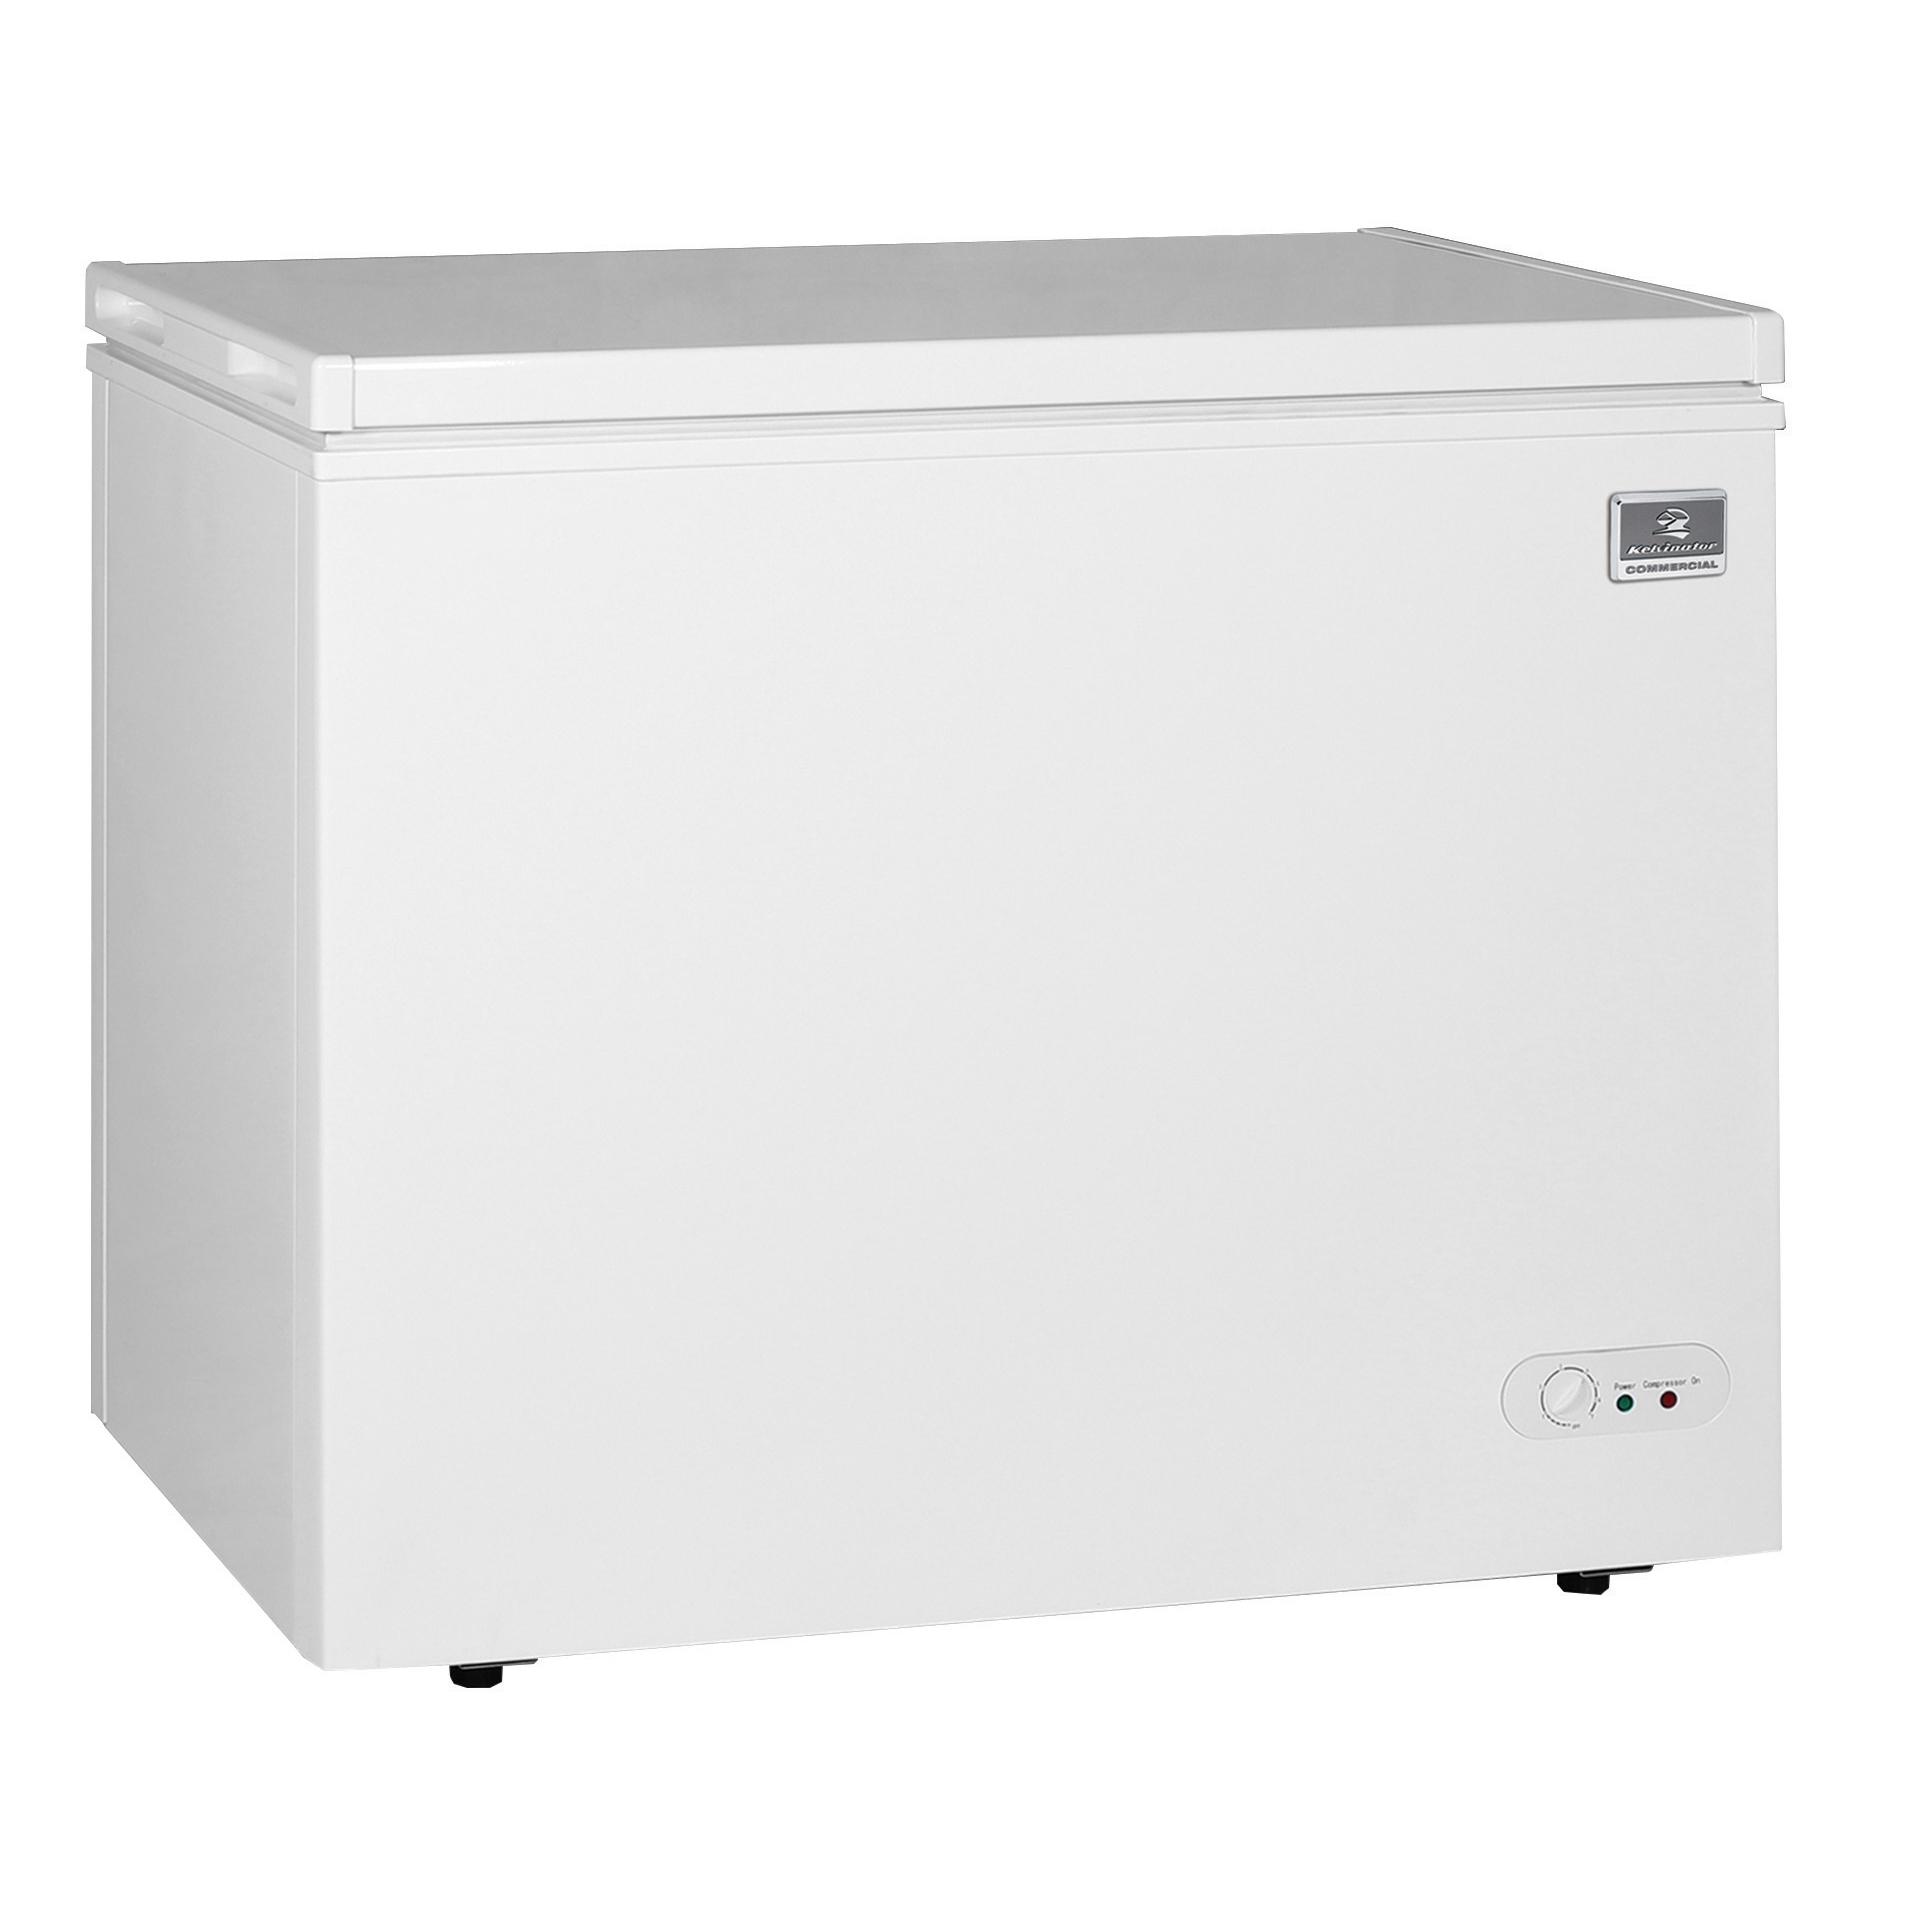 Kelvinator Commercial KCCF073WS chest freezer